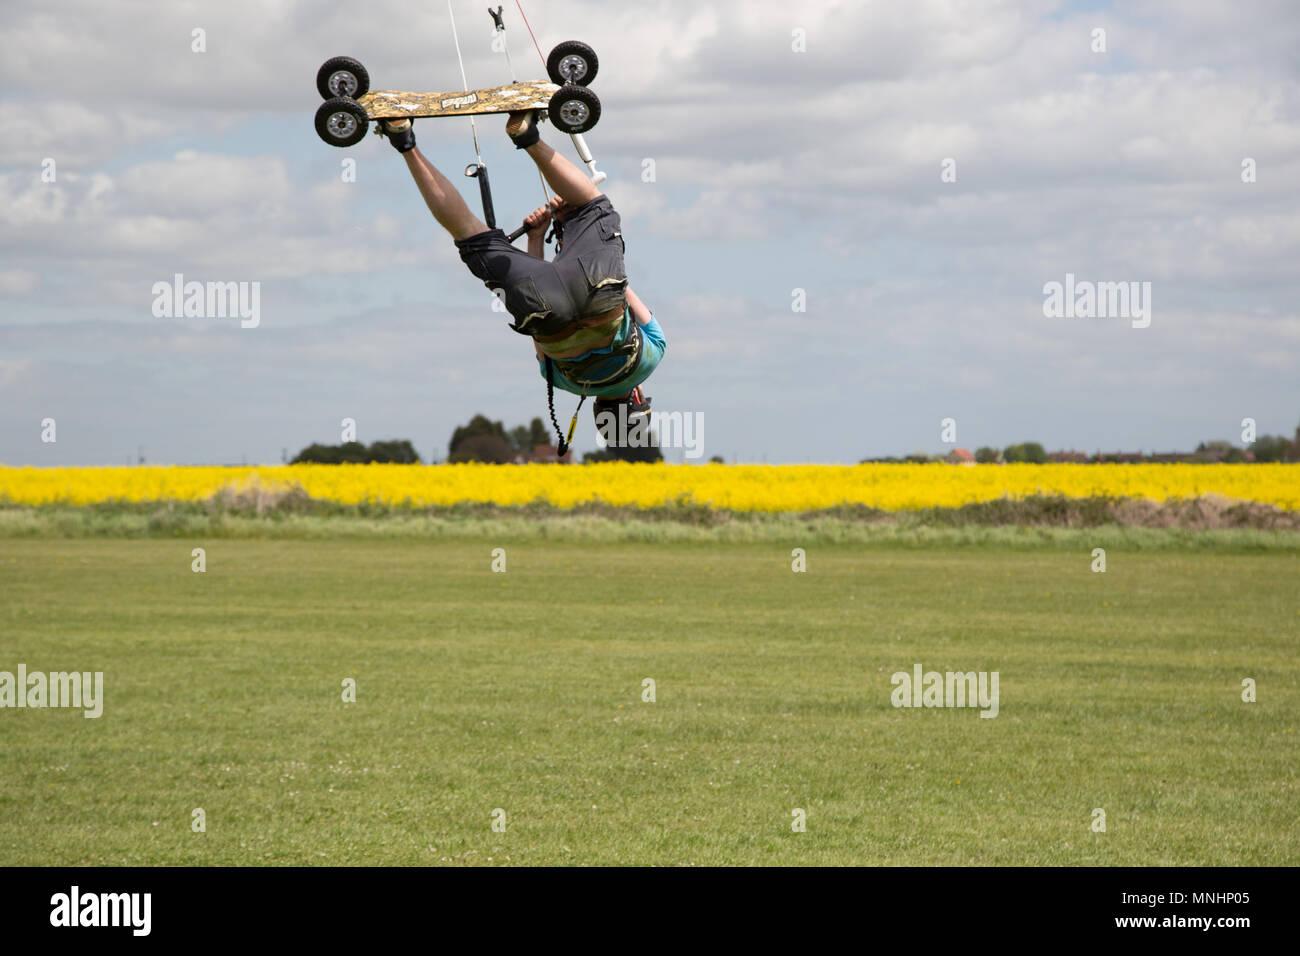 Extreme sport kite landboarding in Essex, UK. Upside down whilst airborne. - Stock Image